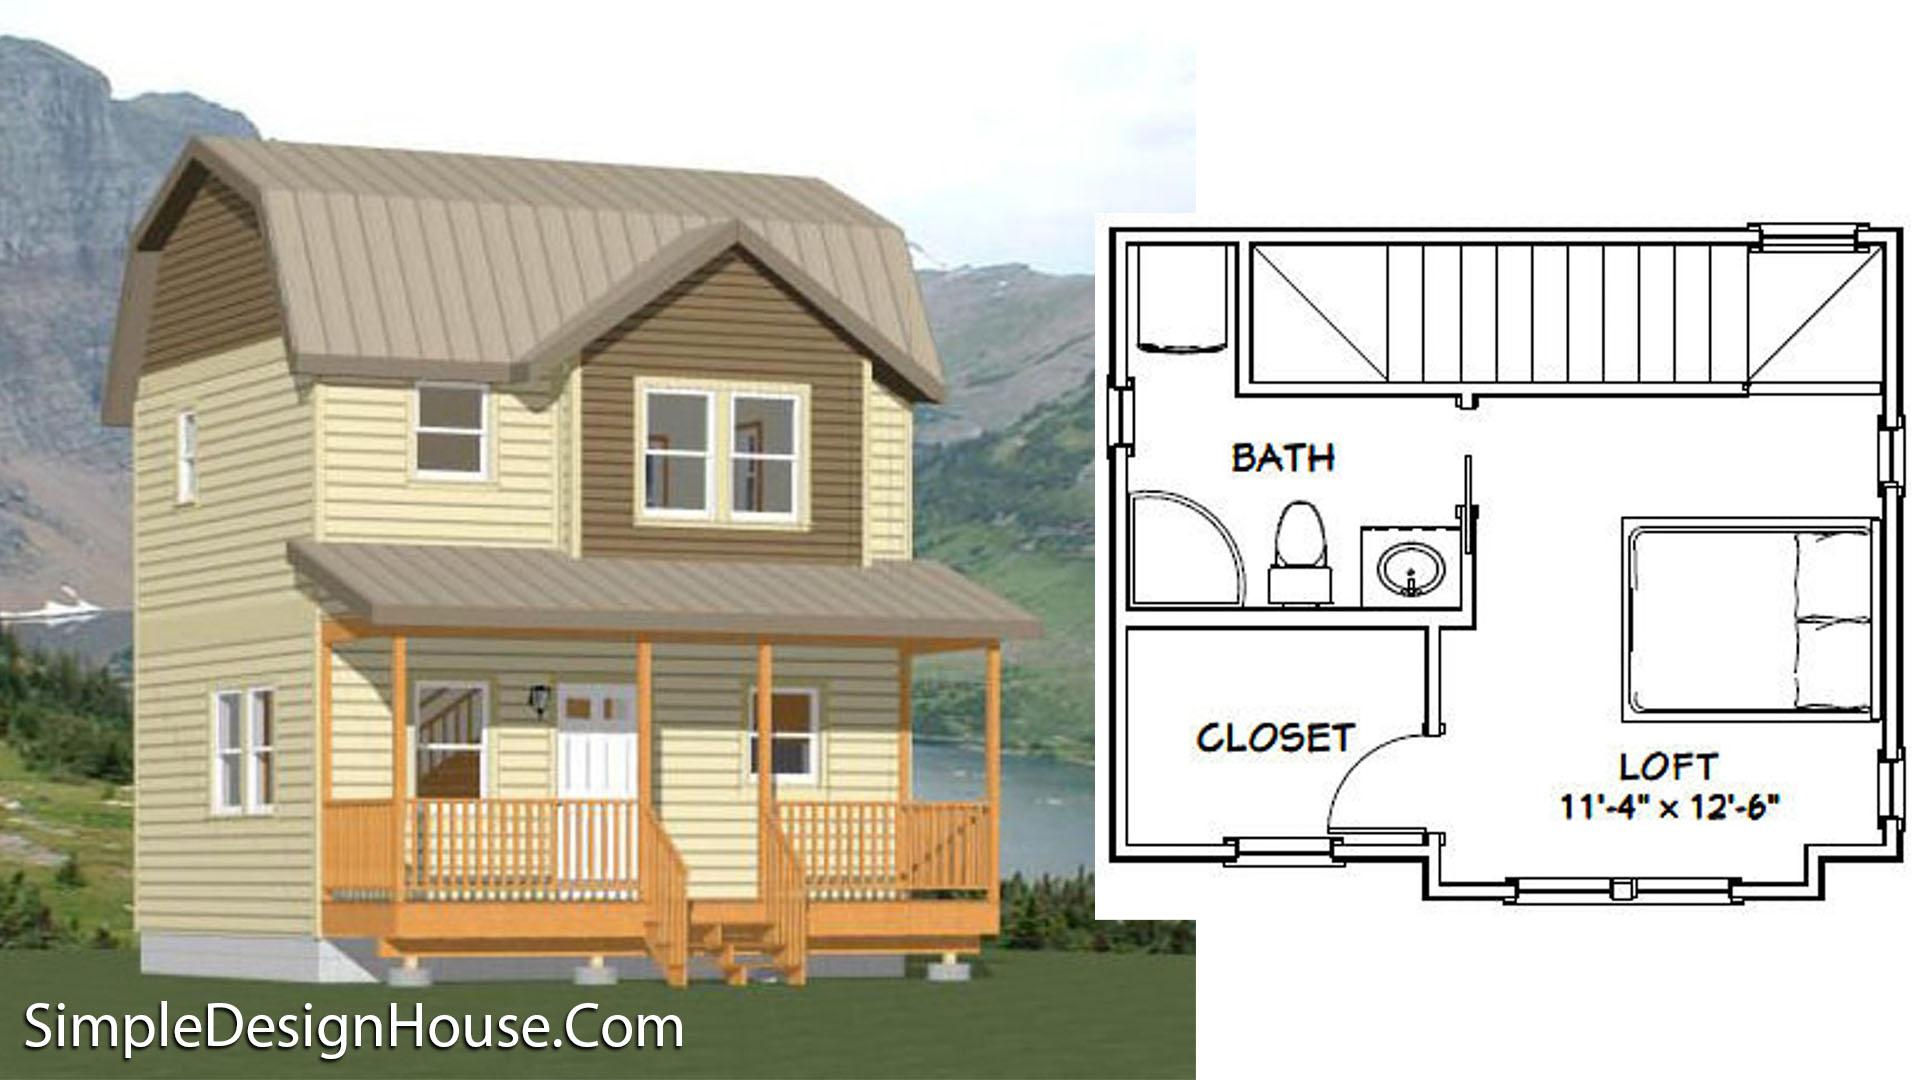 20×16 House Plan 1 Bedroom 1.5 Bath 537 sq ft PDF Floor Plan